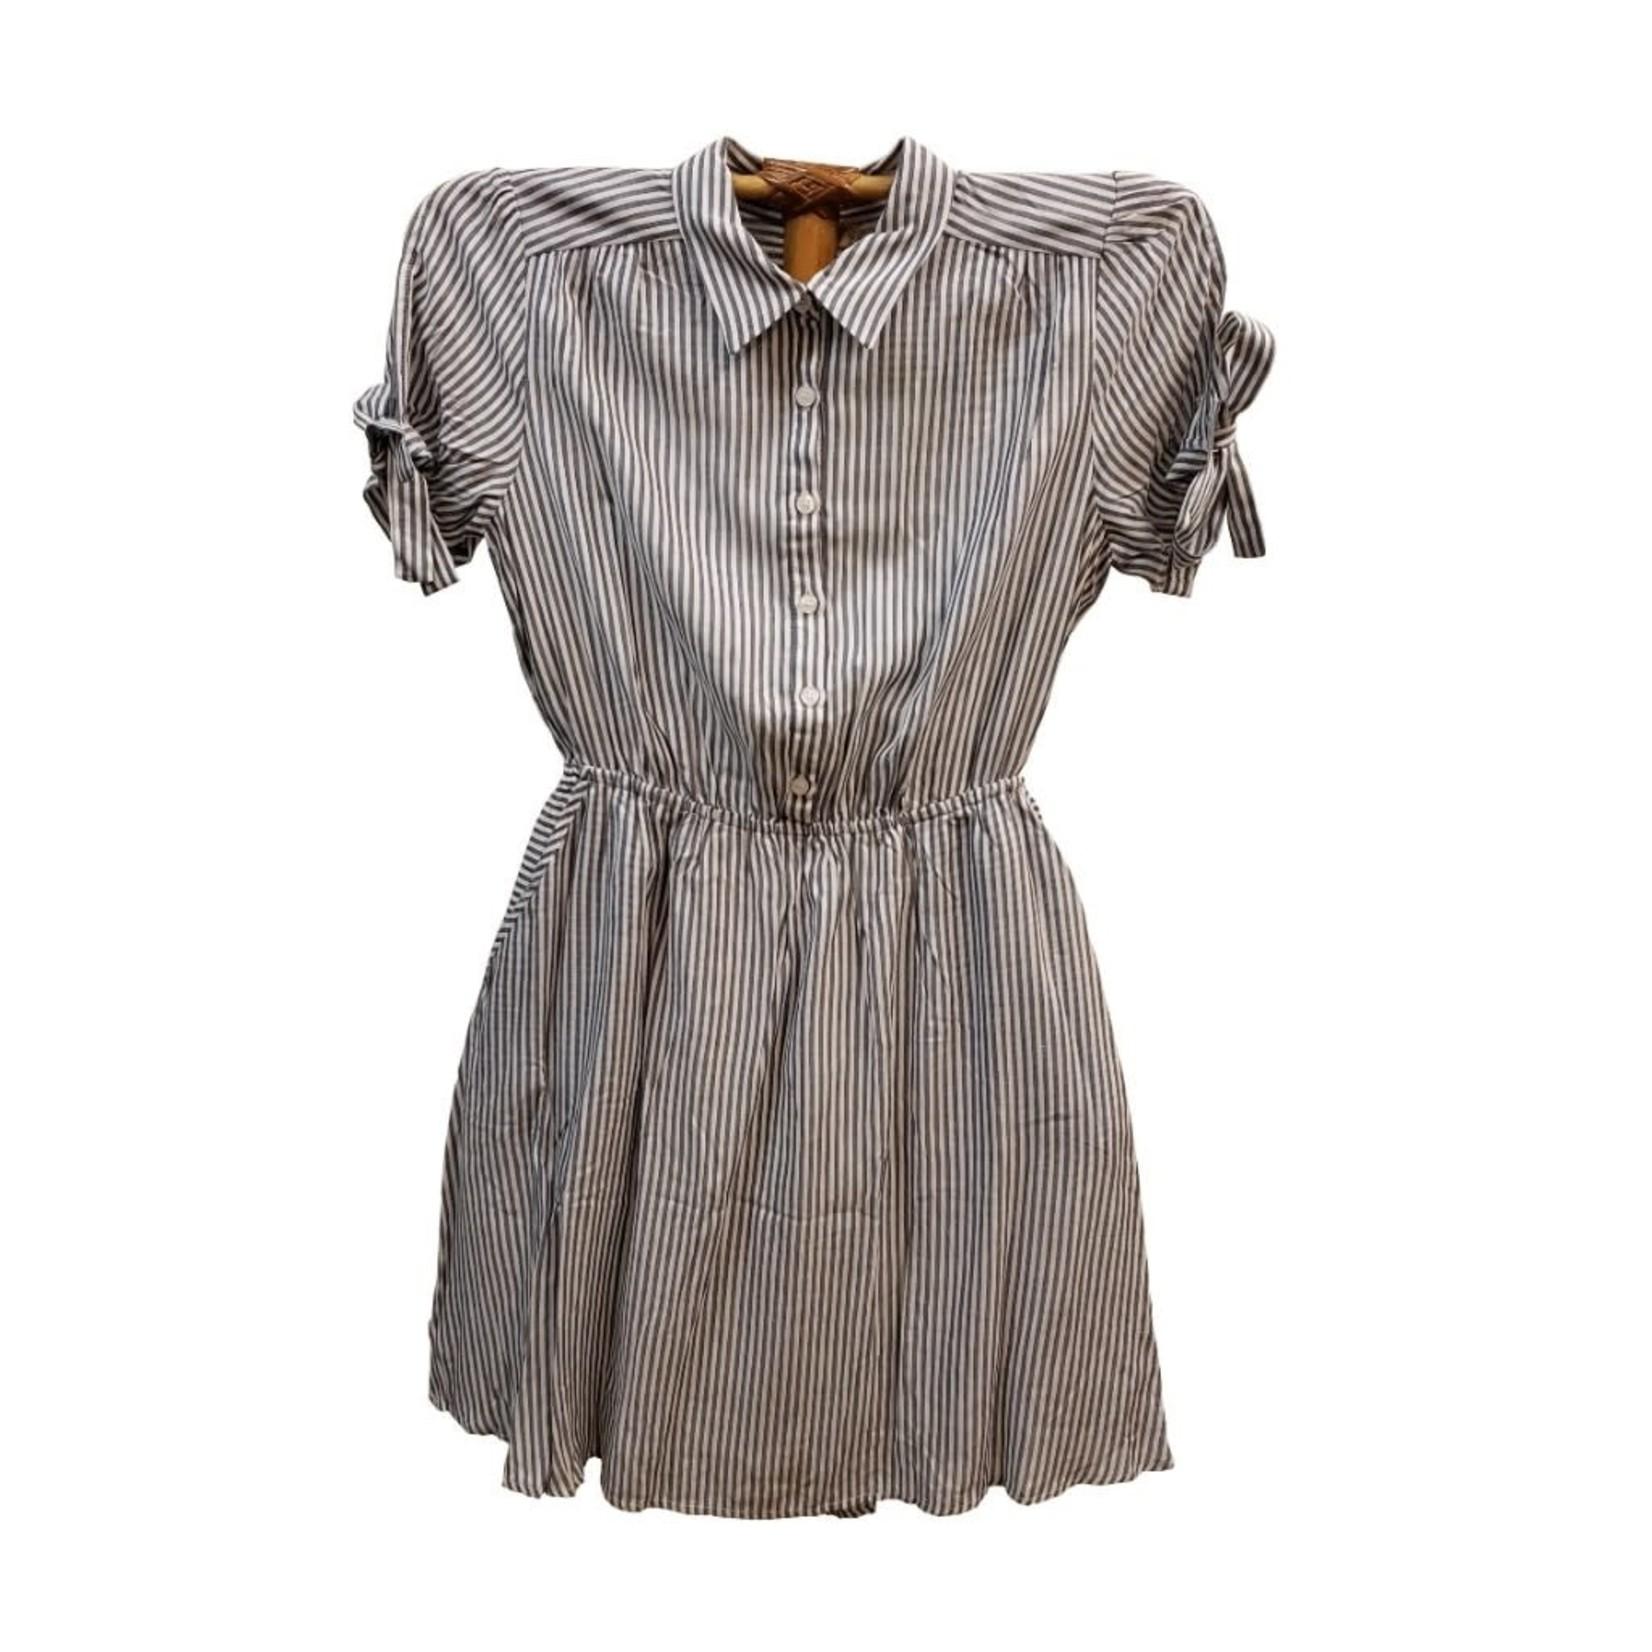 Hem & Thread Stripe Half Button Tie Sleeve Shirt Dress